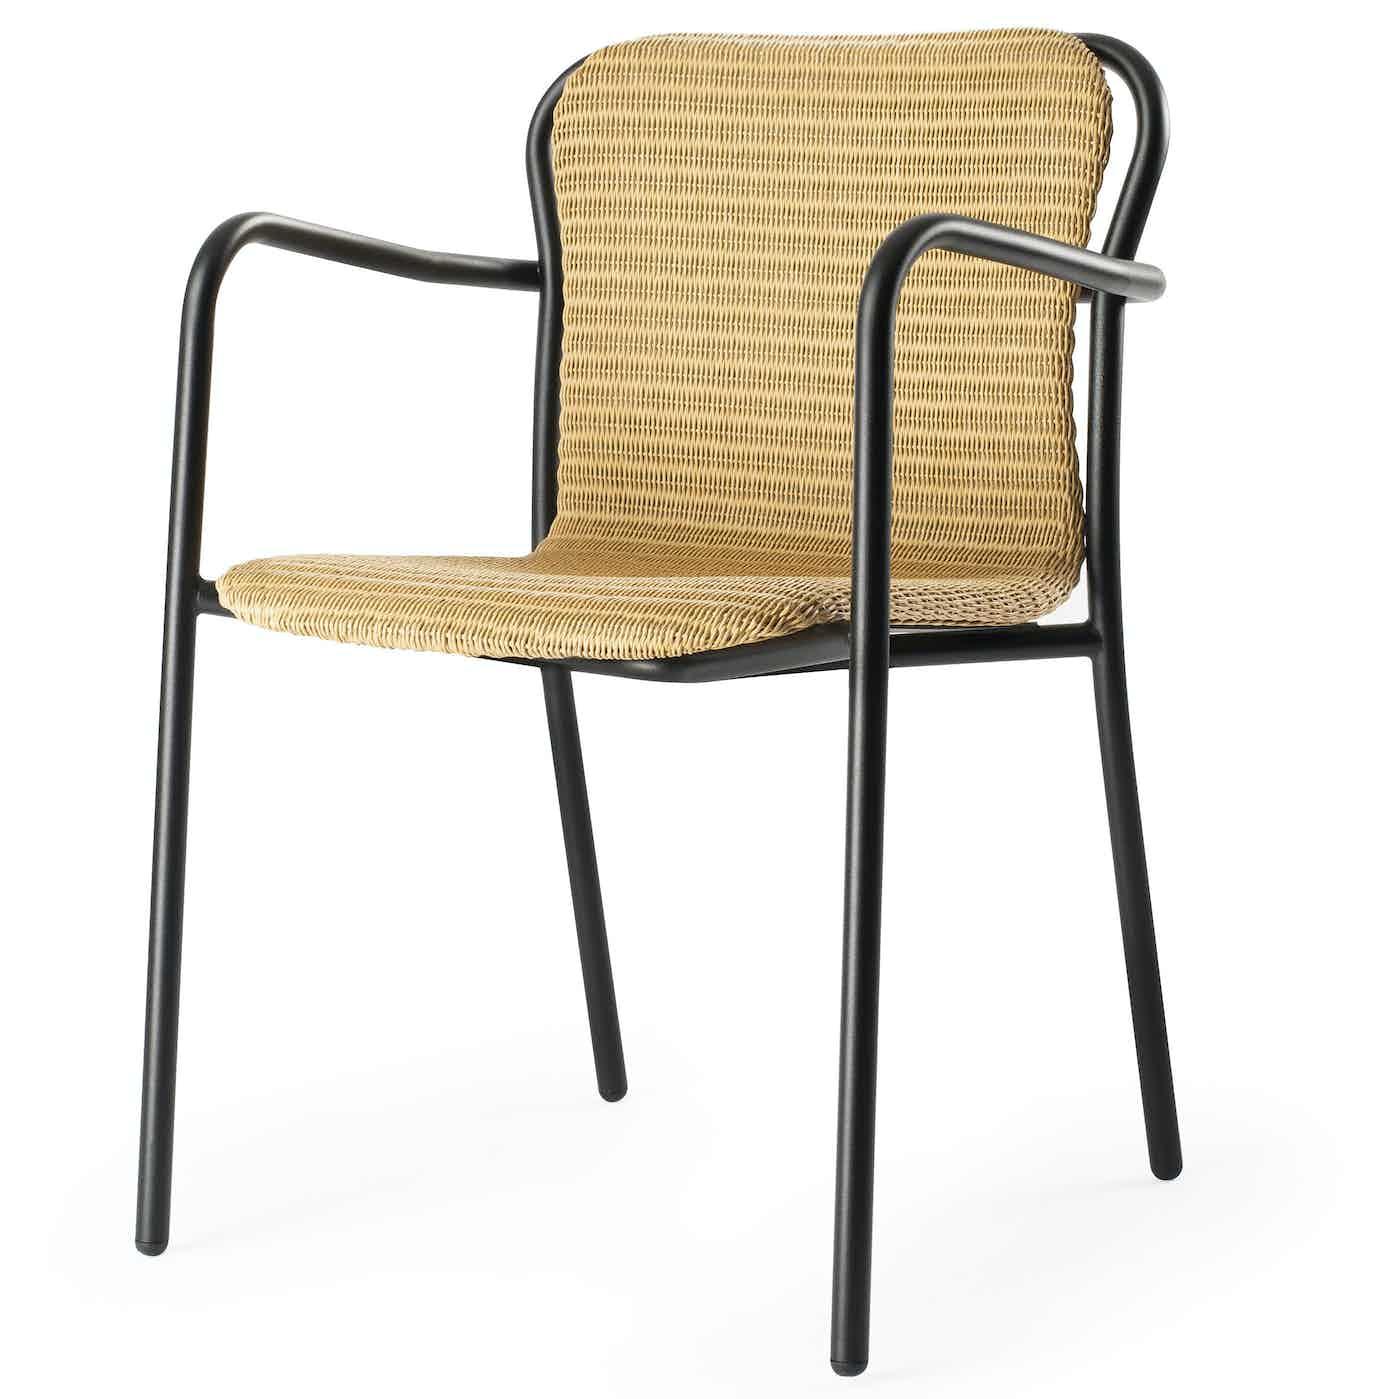 Deadgood-hug-armchair-left-face-haute-living_190226_192705